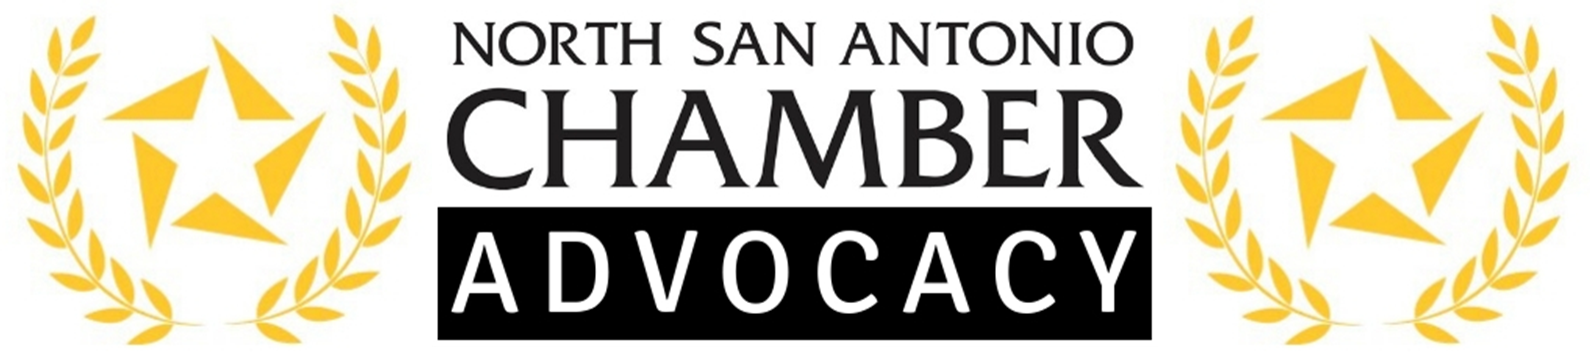 North San Antonio Chamber Advocacy